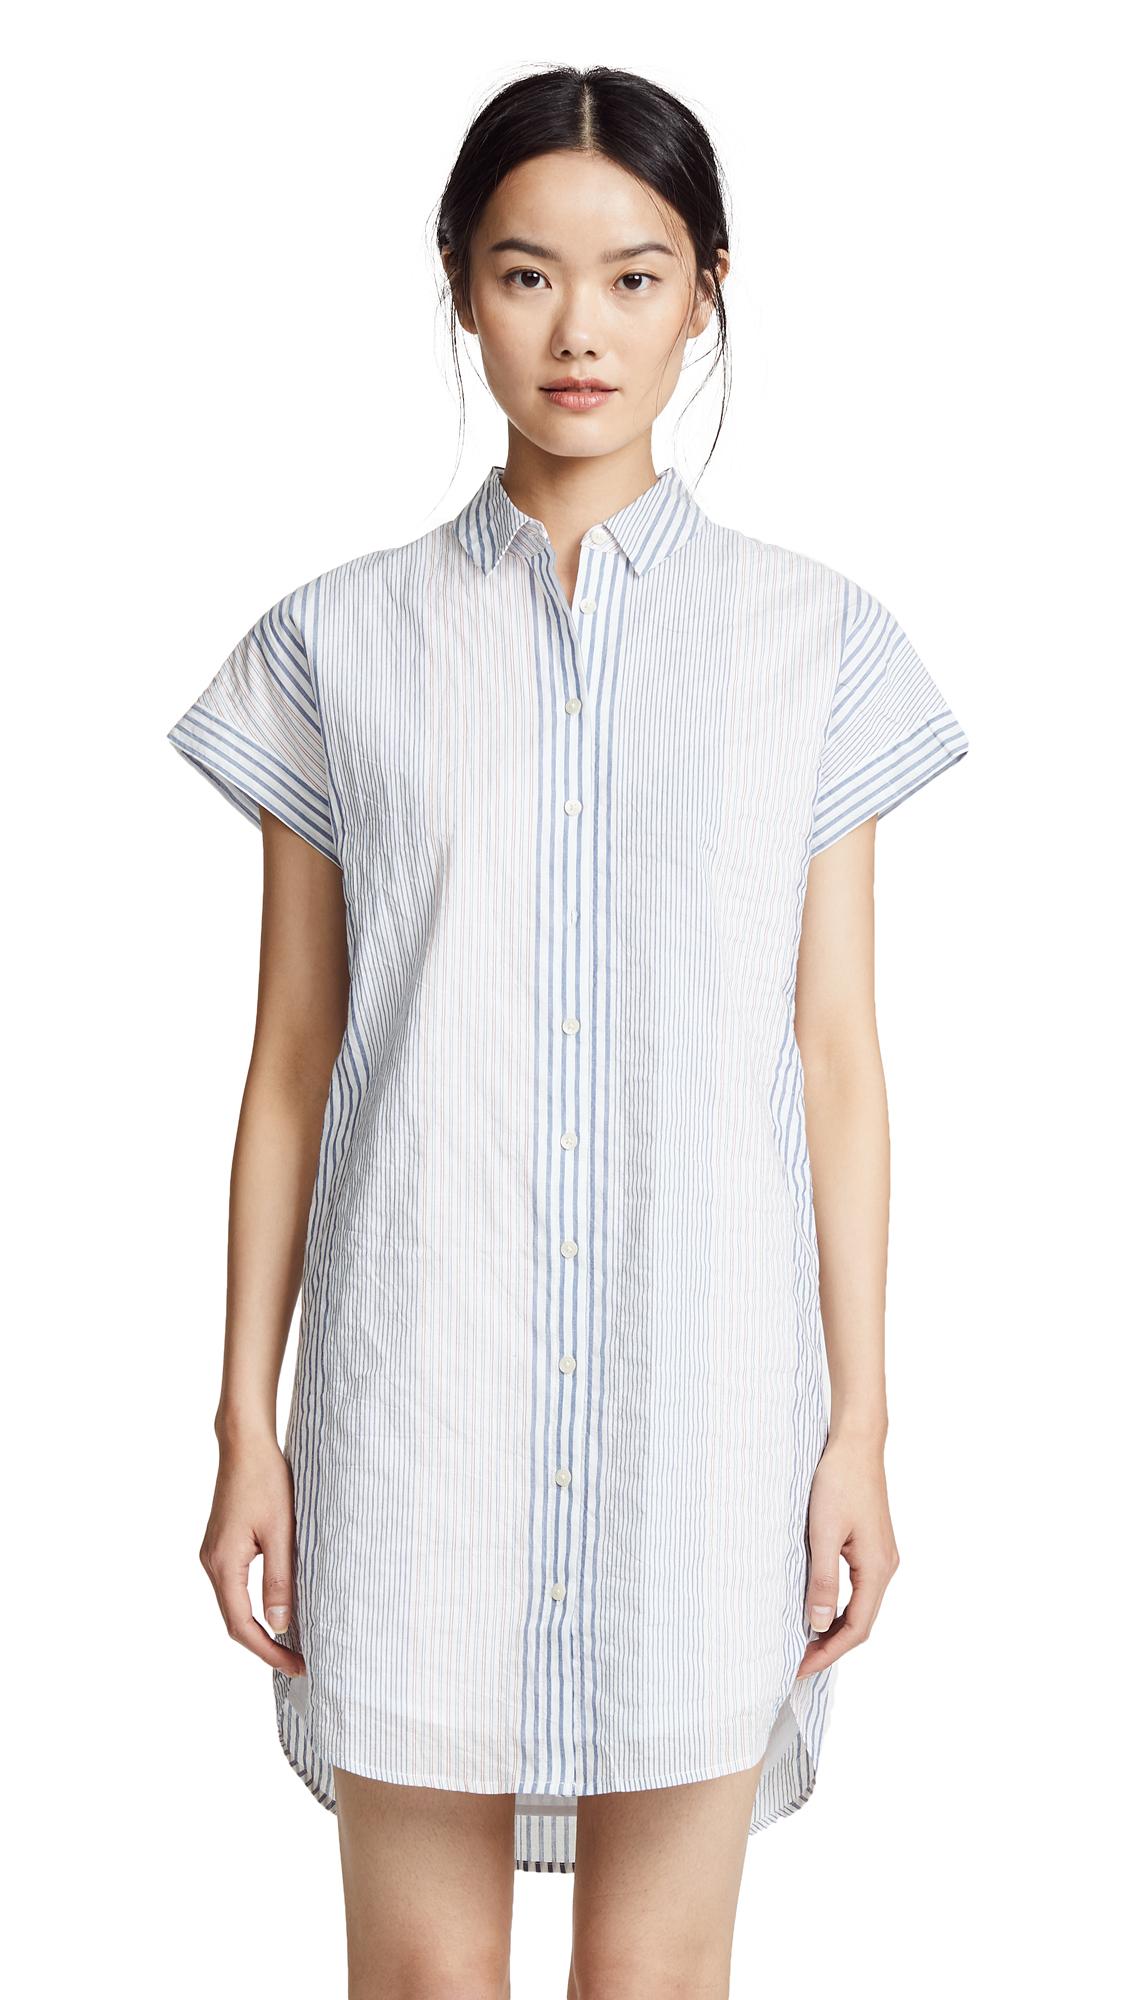 Madewell Multistripe Central Shirtdress